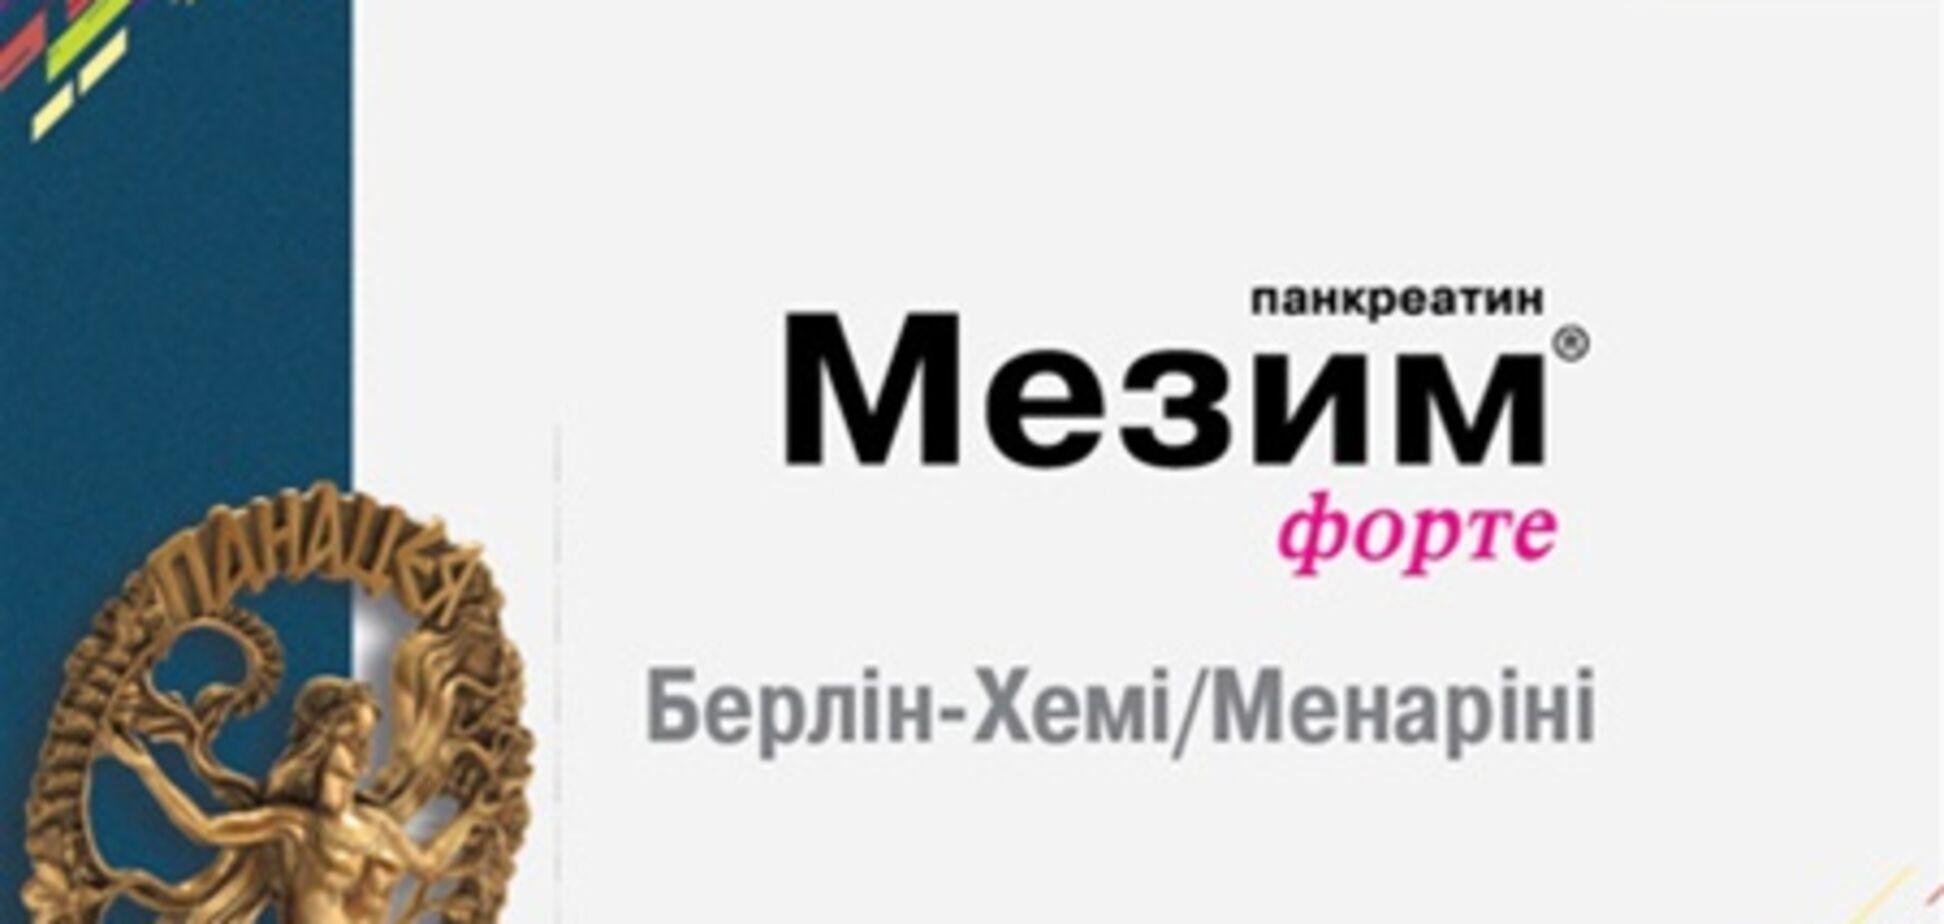 «Берлин Хеми» и Мезим Форте получили награду «Панацея - 2011»